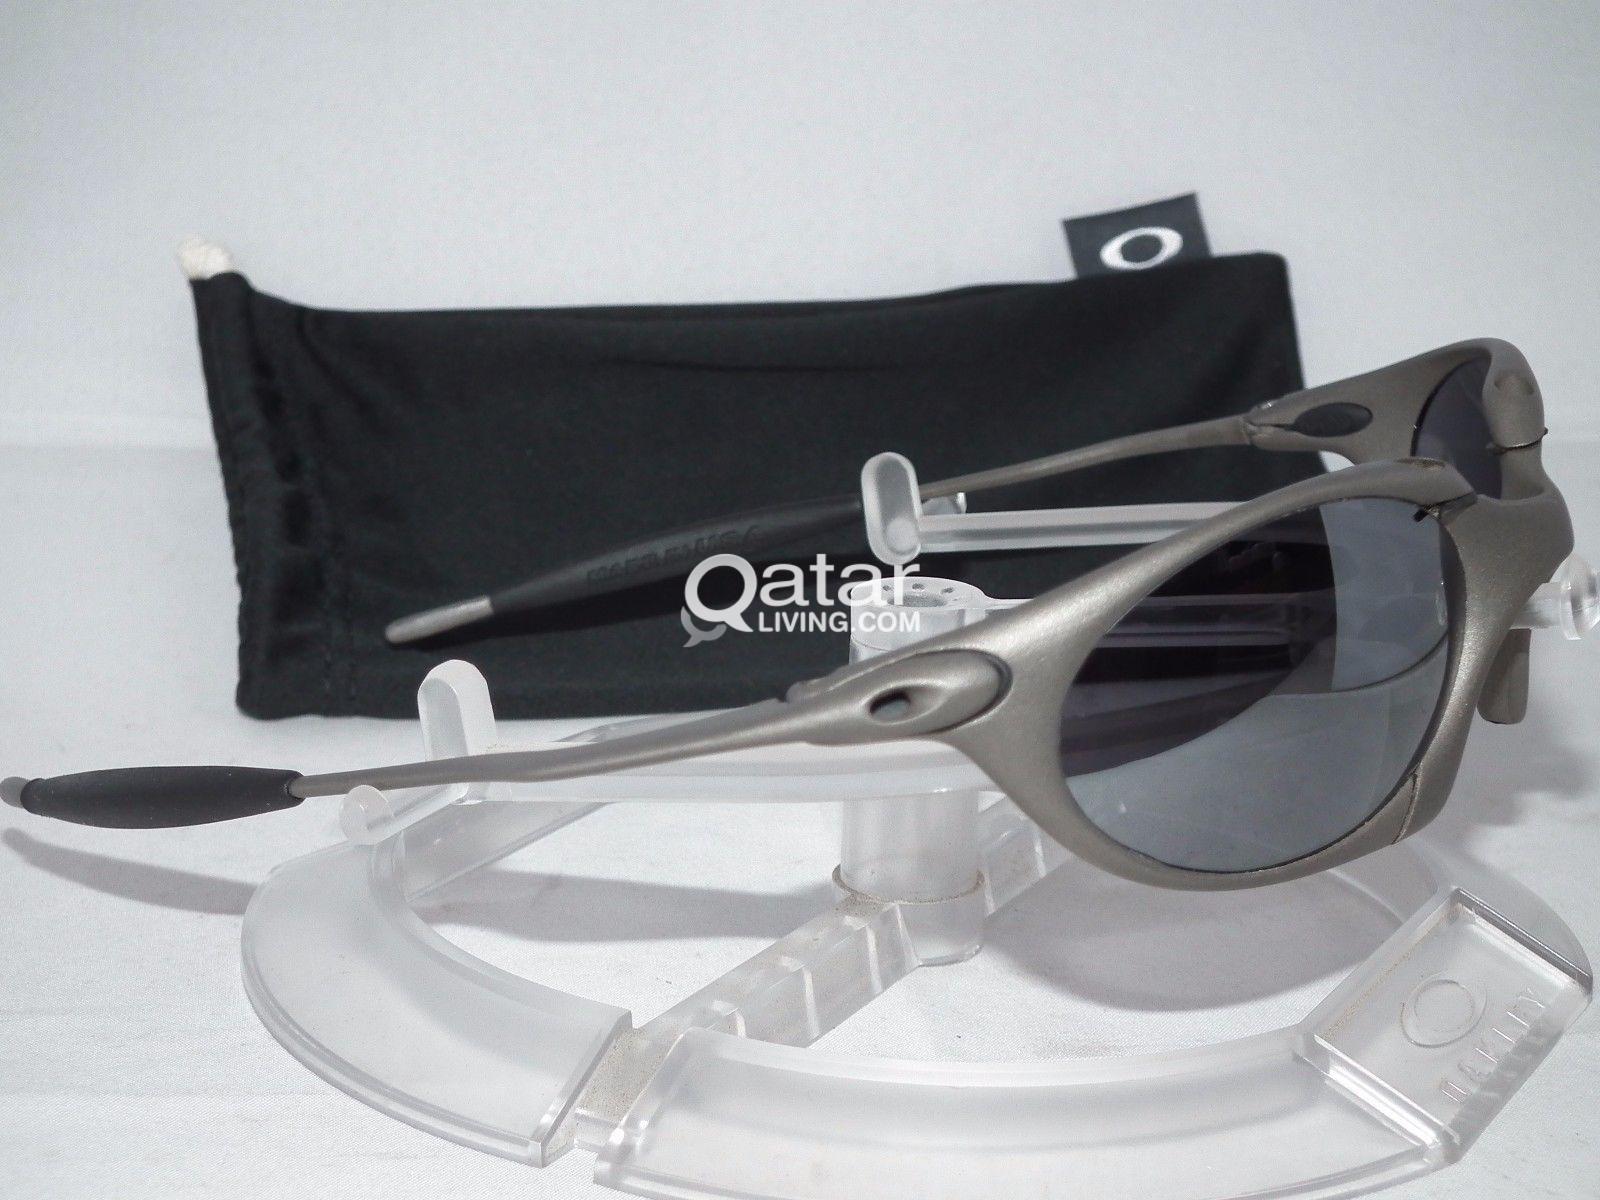 5a61883ed1 ... australia oakley romeo sunglasses r1 04 100 x metal black iridium  serial 73002 93c2c